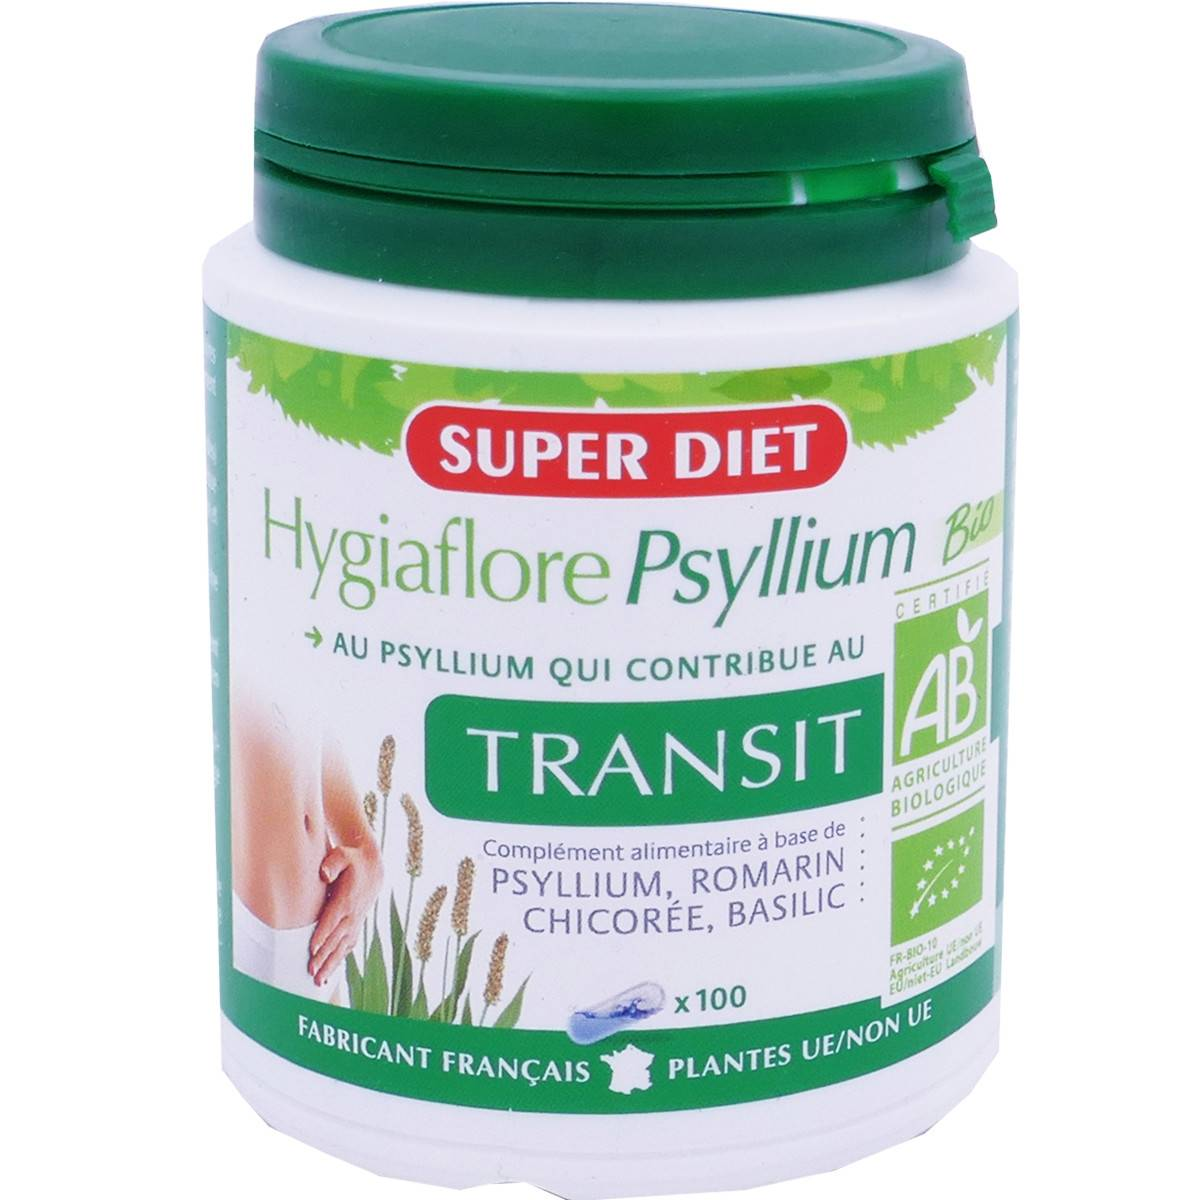 SUPER DIET Superdiet hygiaflore psyllium bio transit 100 gelules